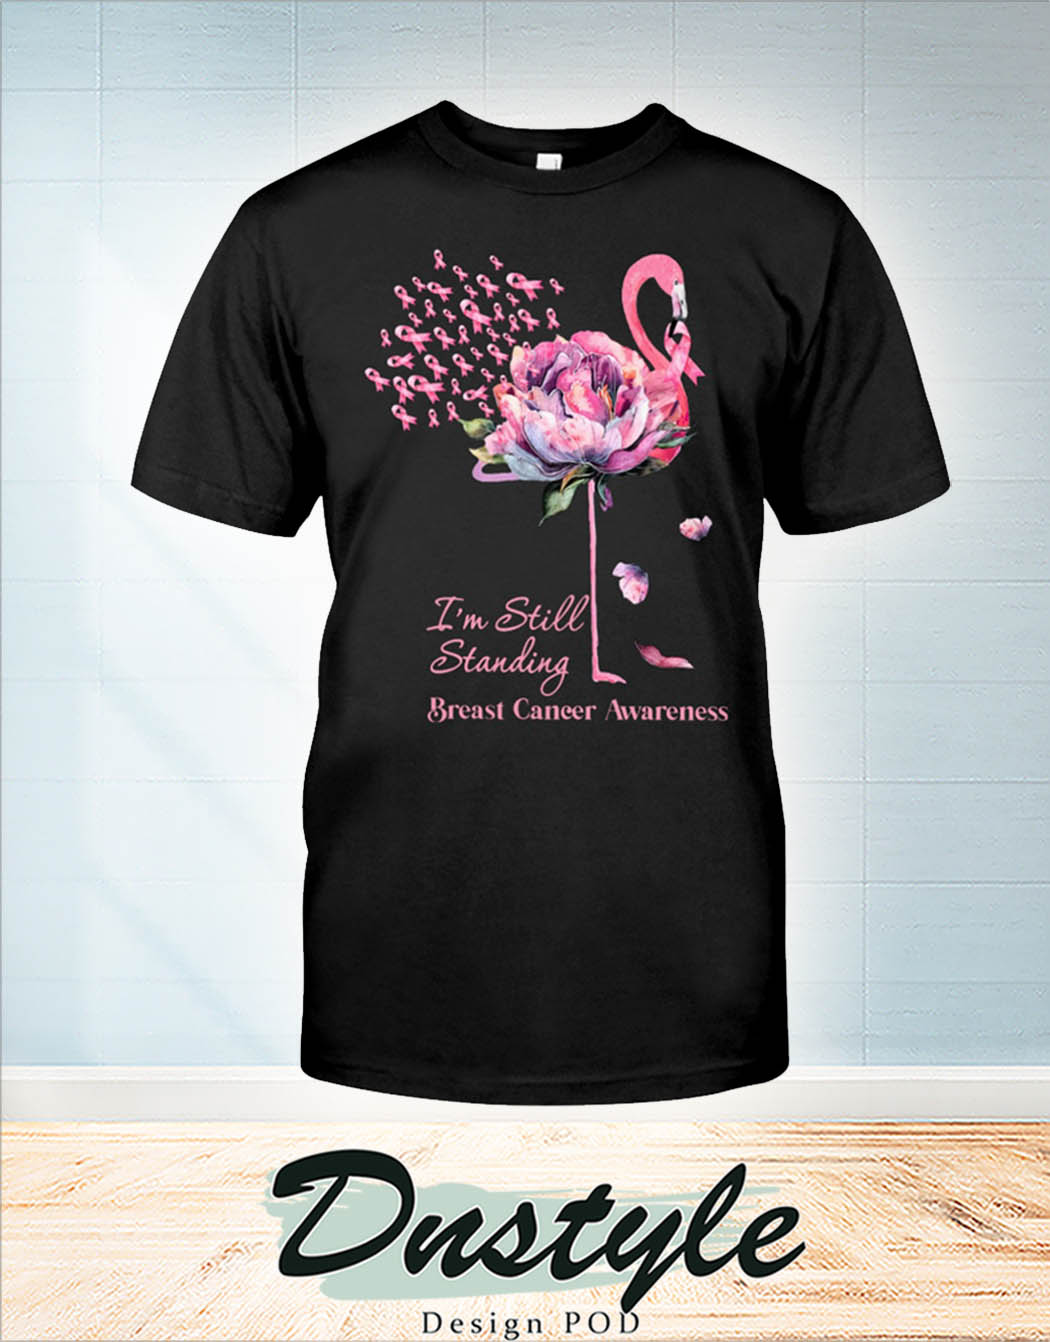 Flamingo I'm still standing breast cancer awareness t-shirt